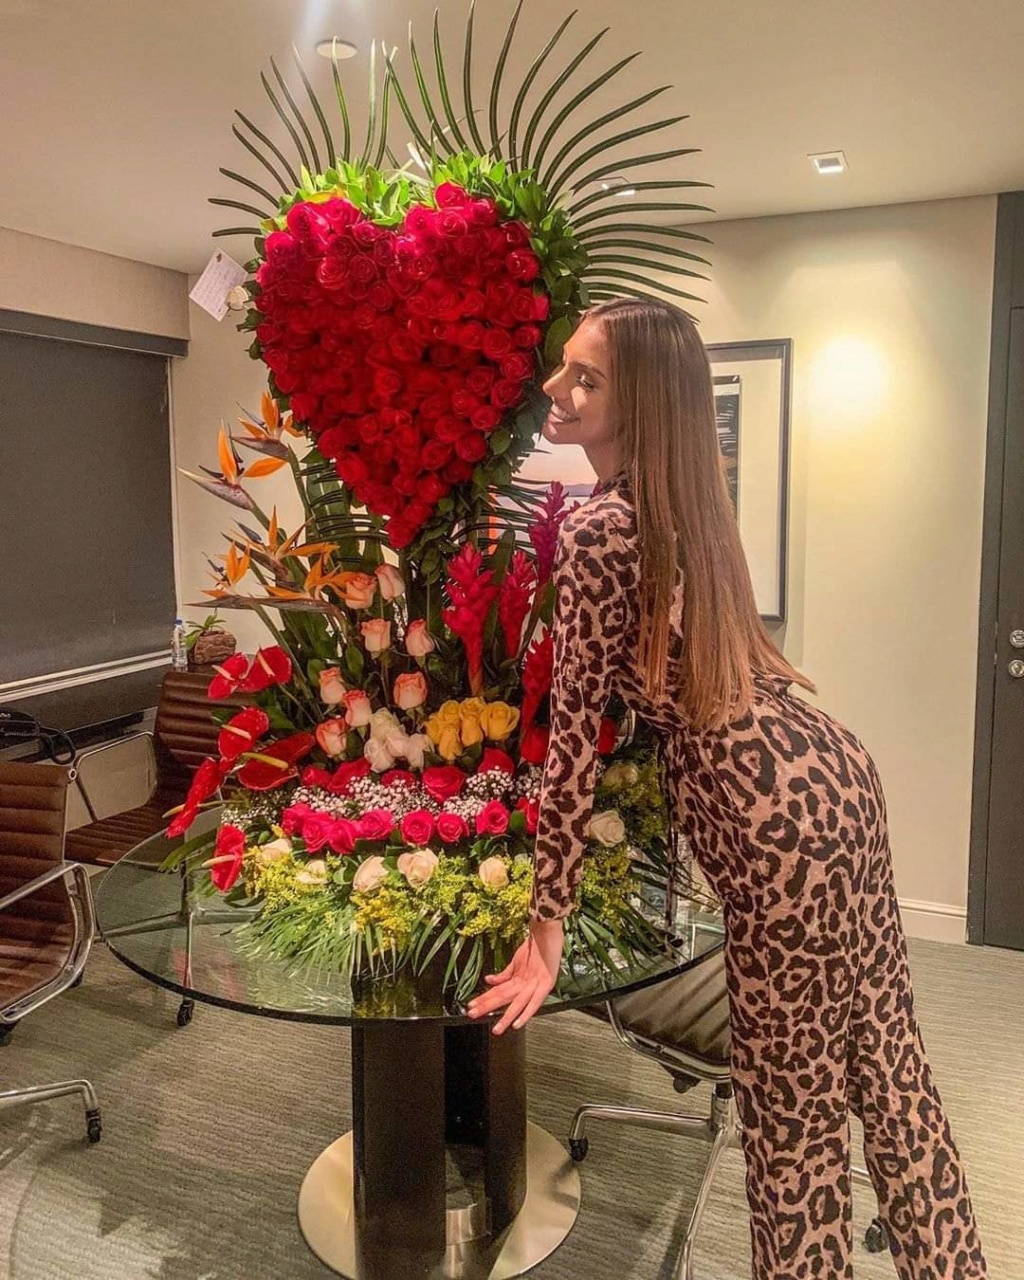 Official Thread of MISS GRAND INTERNATIONAL 2019 - Lourdes Valentina Figuera - VENEZUELA Fb_11856